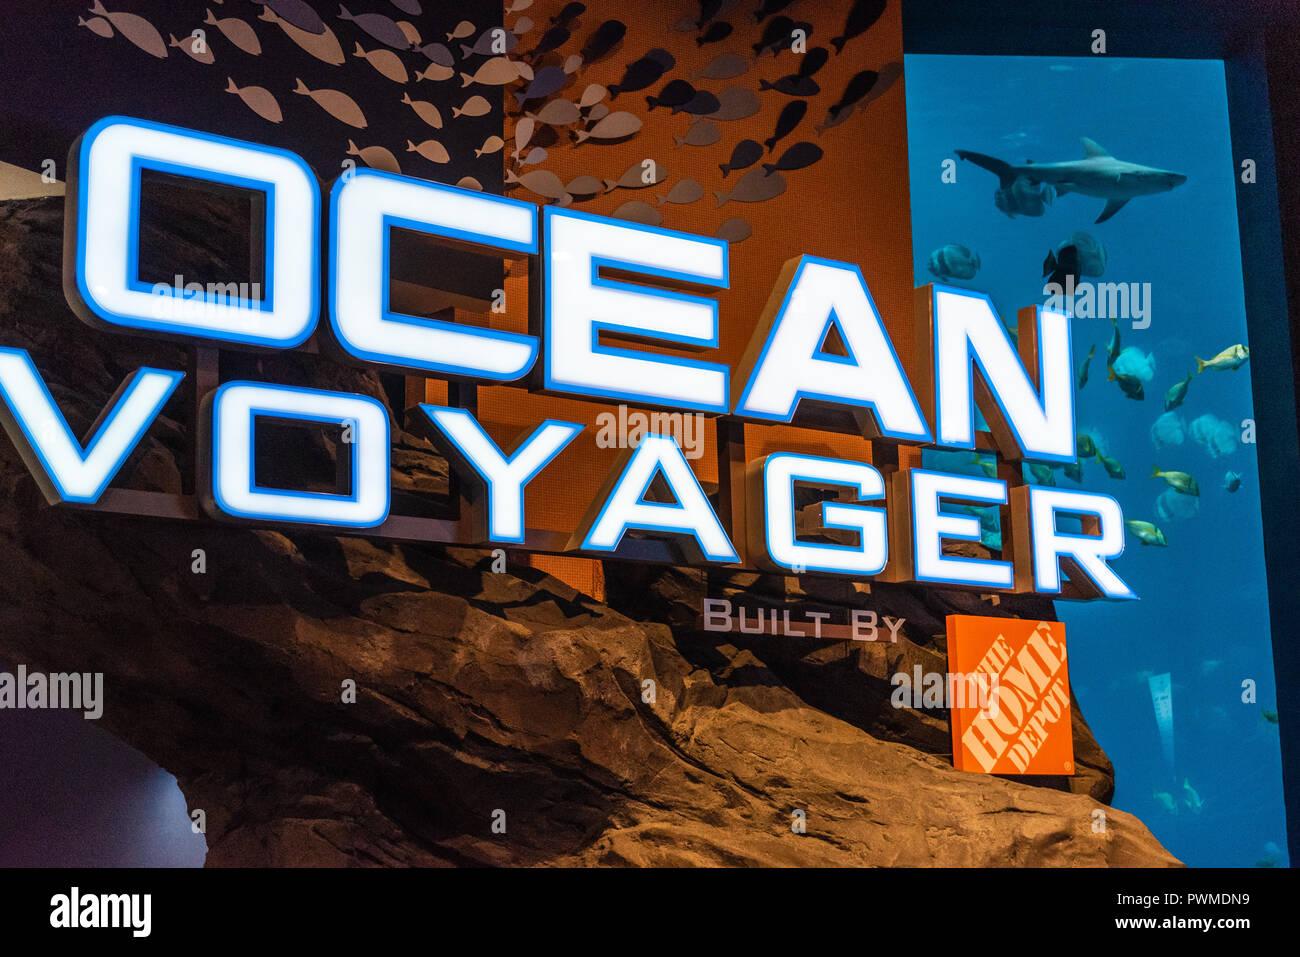 The Georgia Aquarium's Ocean Voyager exhibit, built by The Home Depot, is the largest indoor aquatic habitat in the world. (Atlanta, GA, USA) - Stock Image